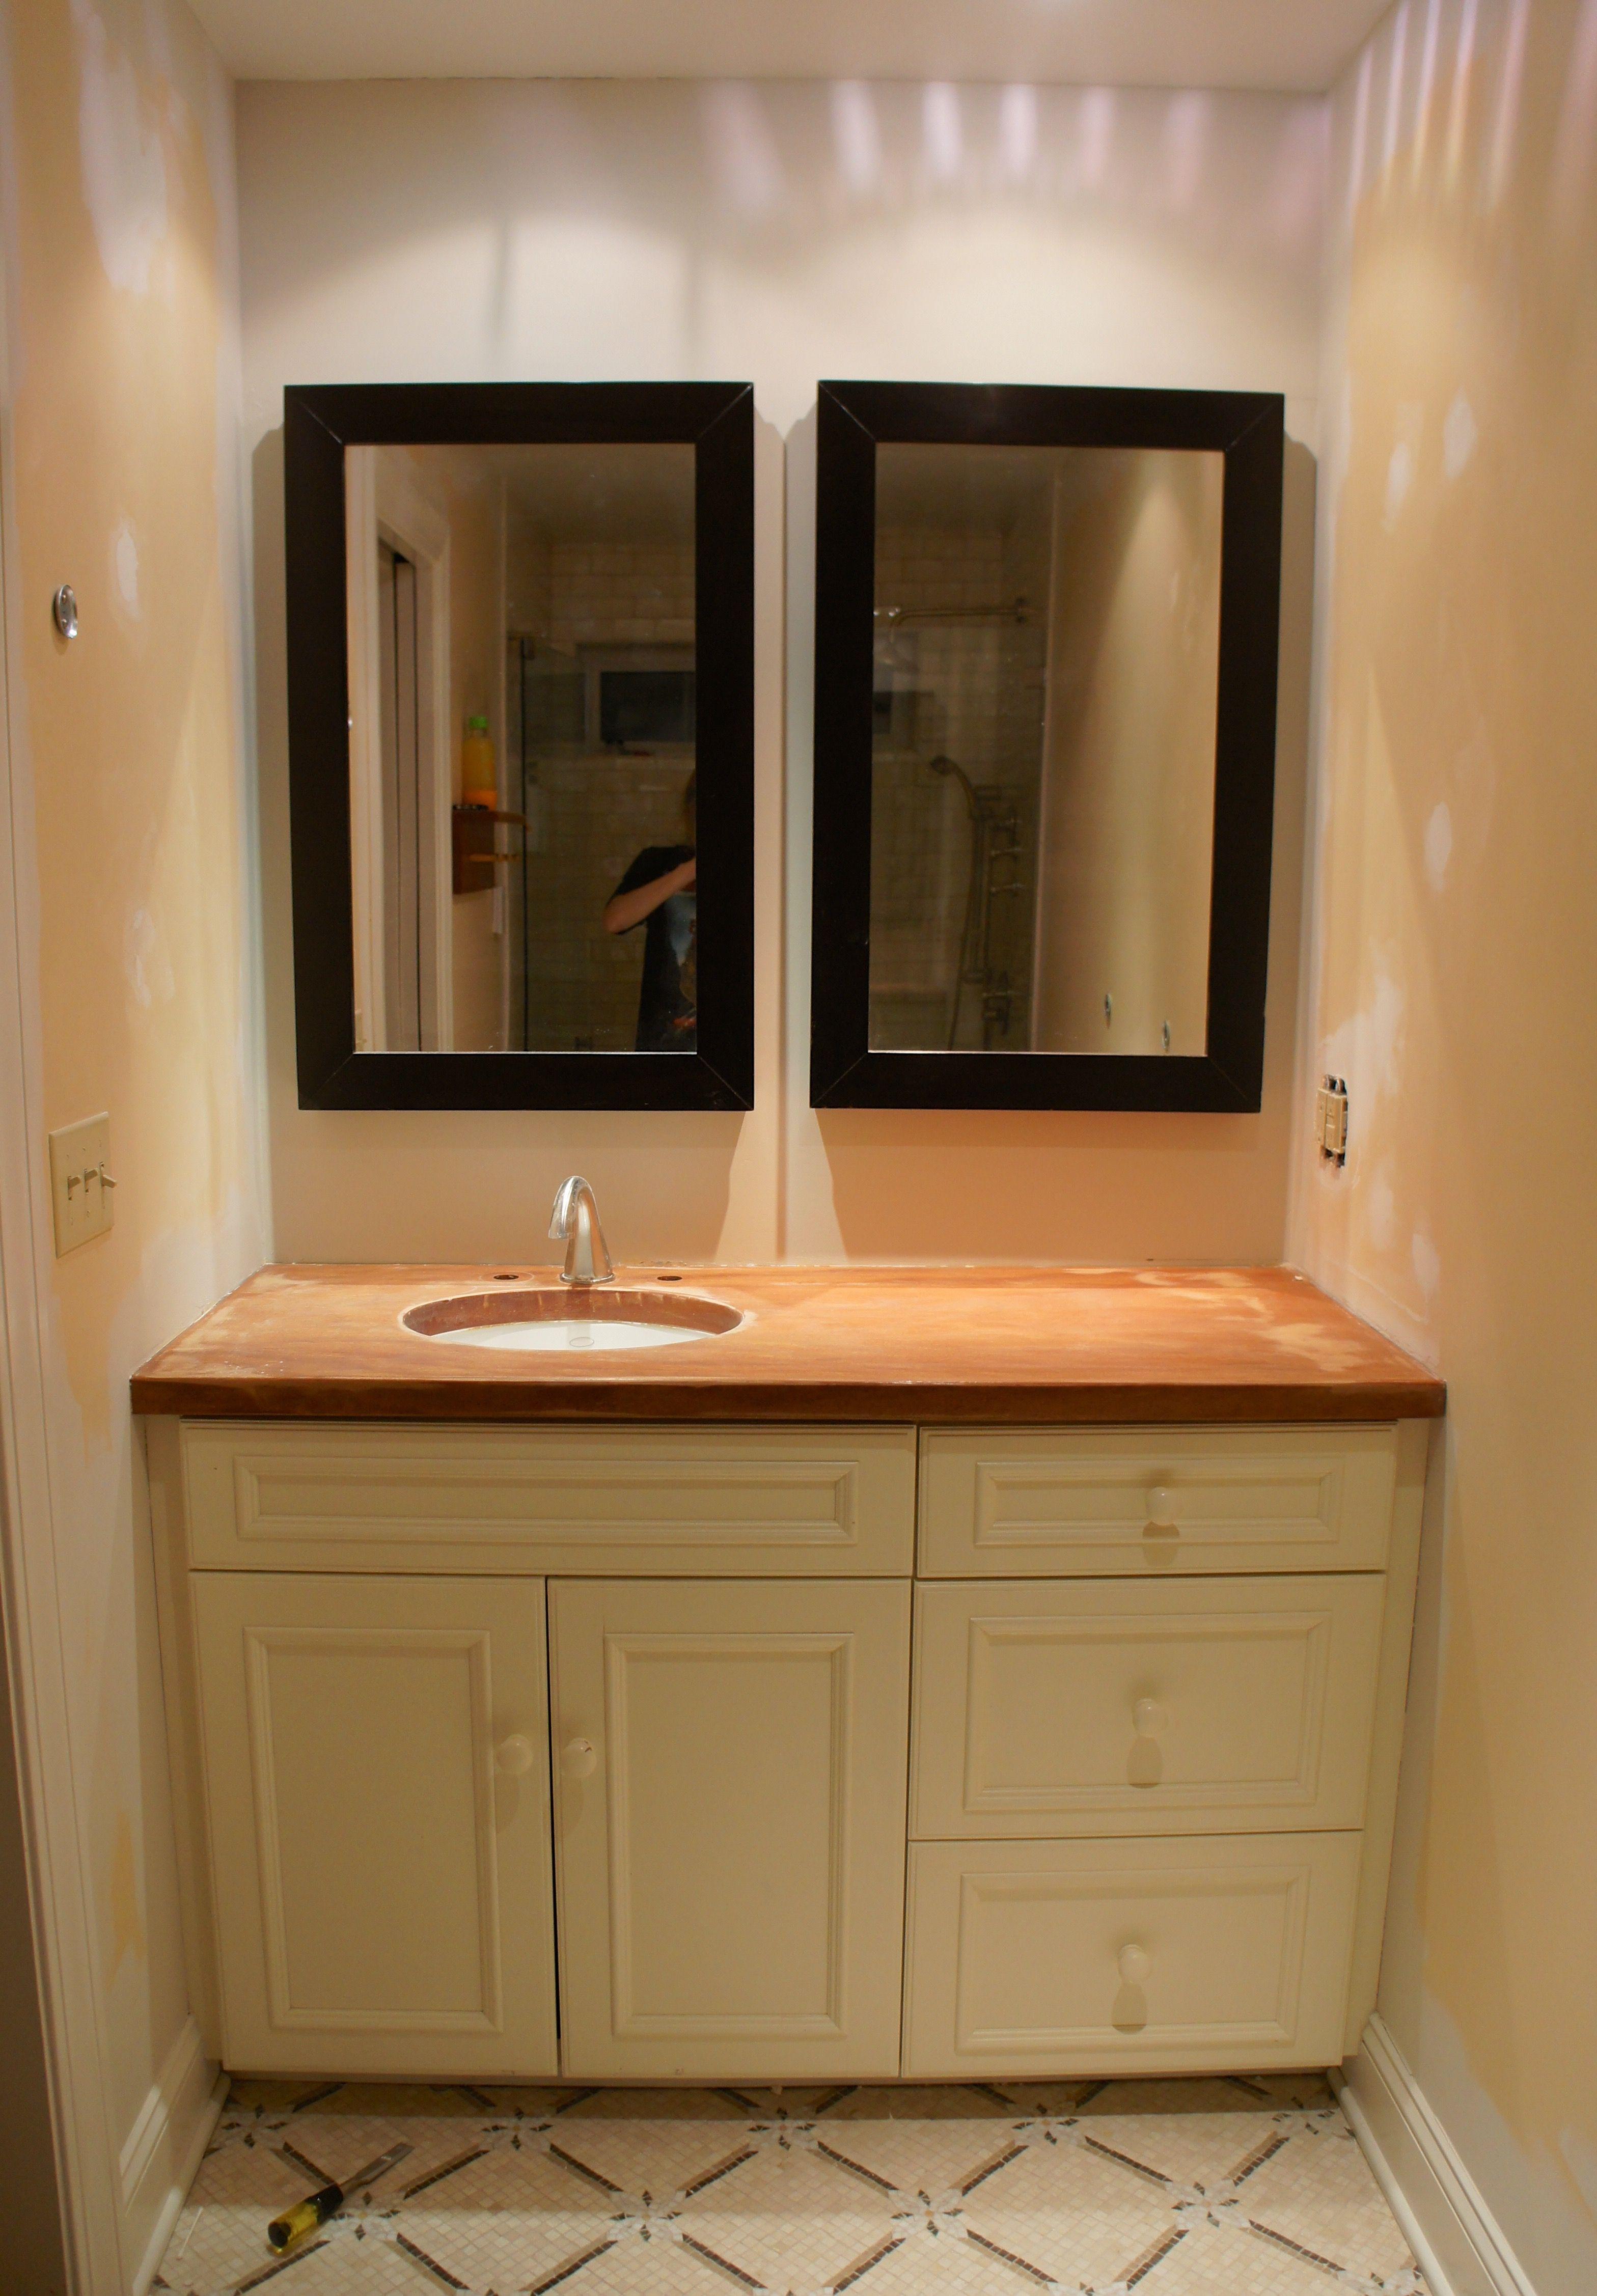 Remnant Vanity Top Installation Kitchen Cabinets Pinterest - Remnant kitchen cabinets